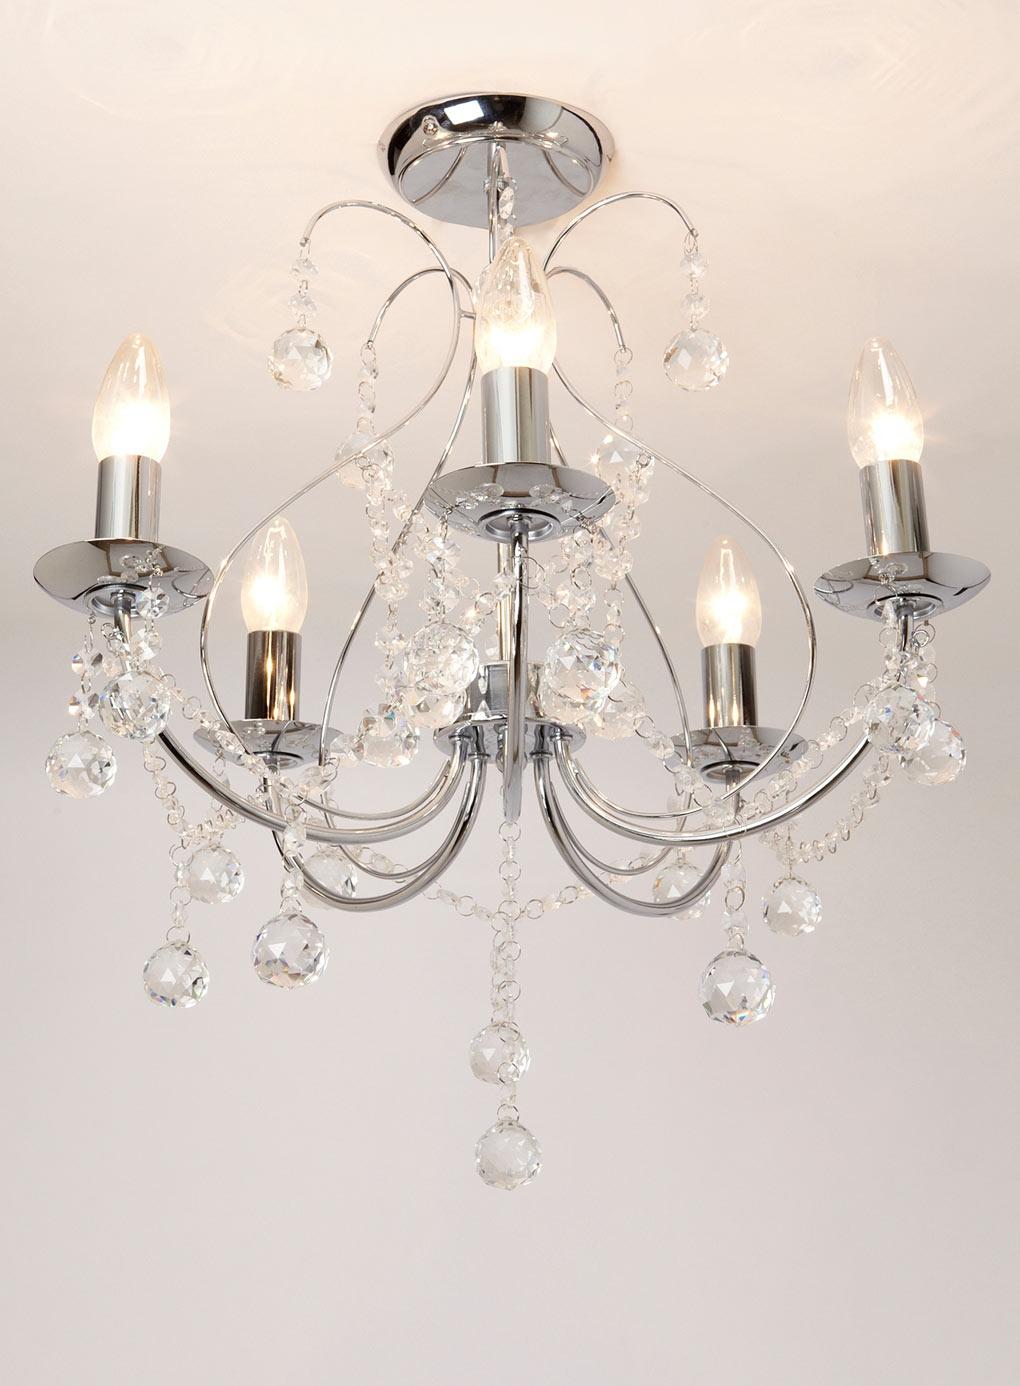 Living Room Light For The Home Pinterest Vintage Style In Flush Chandelier (Image 11 of 15)